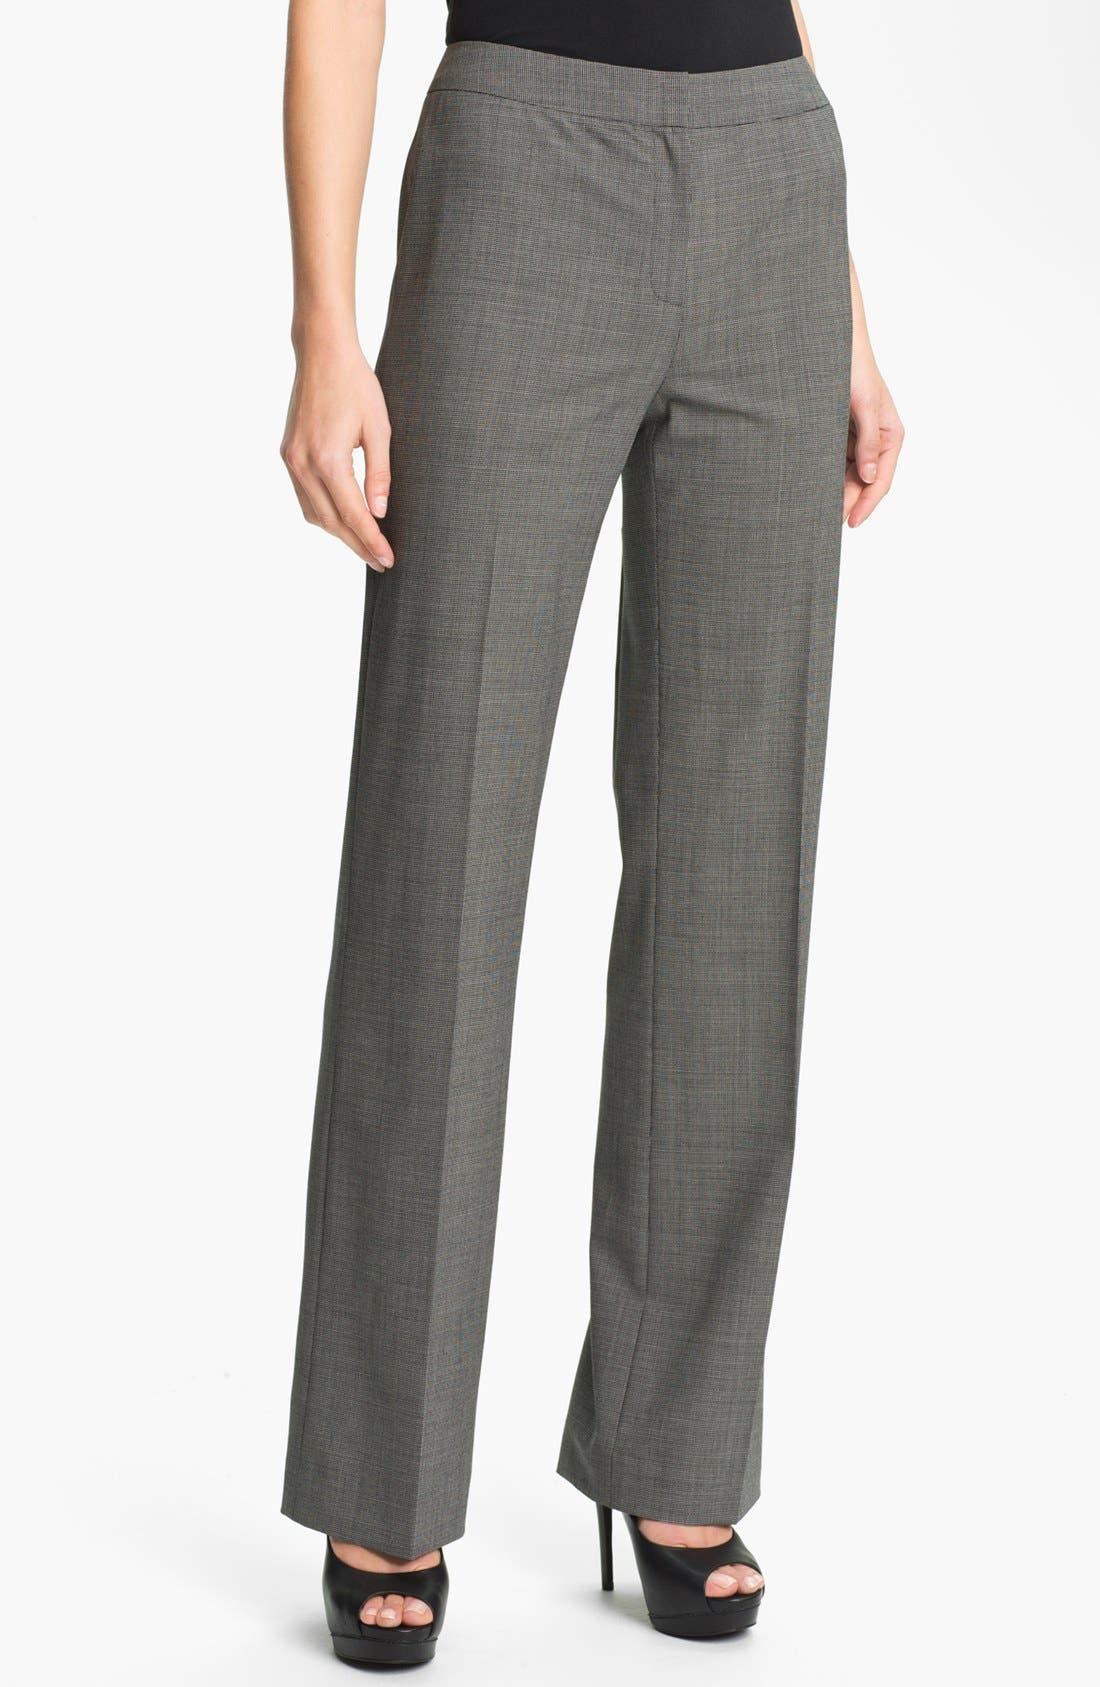 Alternate Image 1 Selected - Lafayette 148 New York Crosshatch Suiting Pants (Petite)